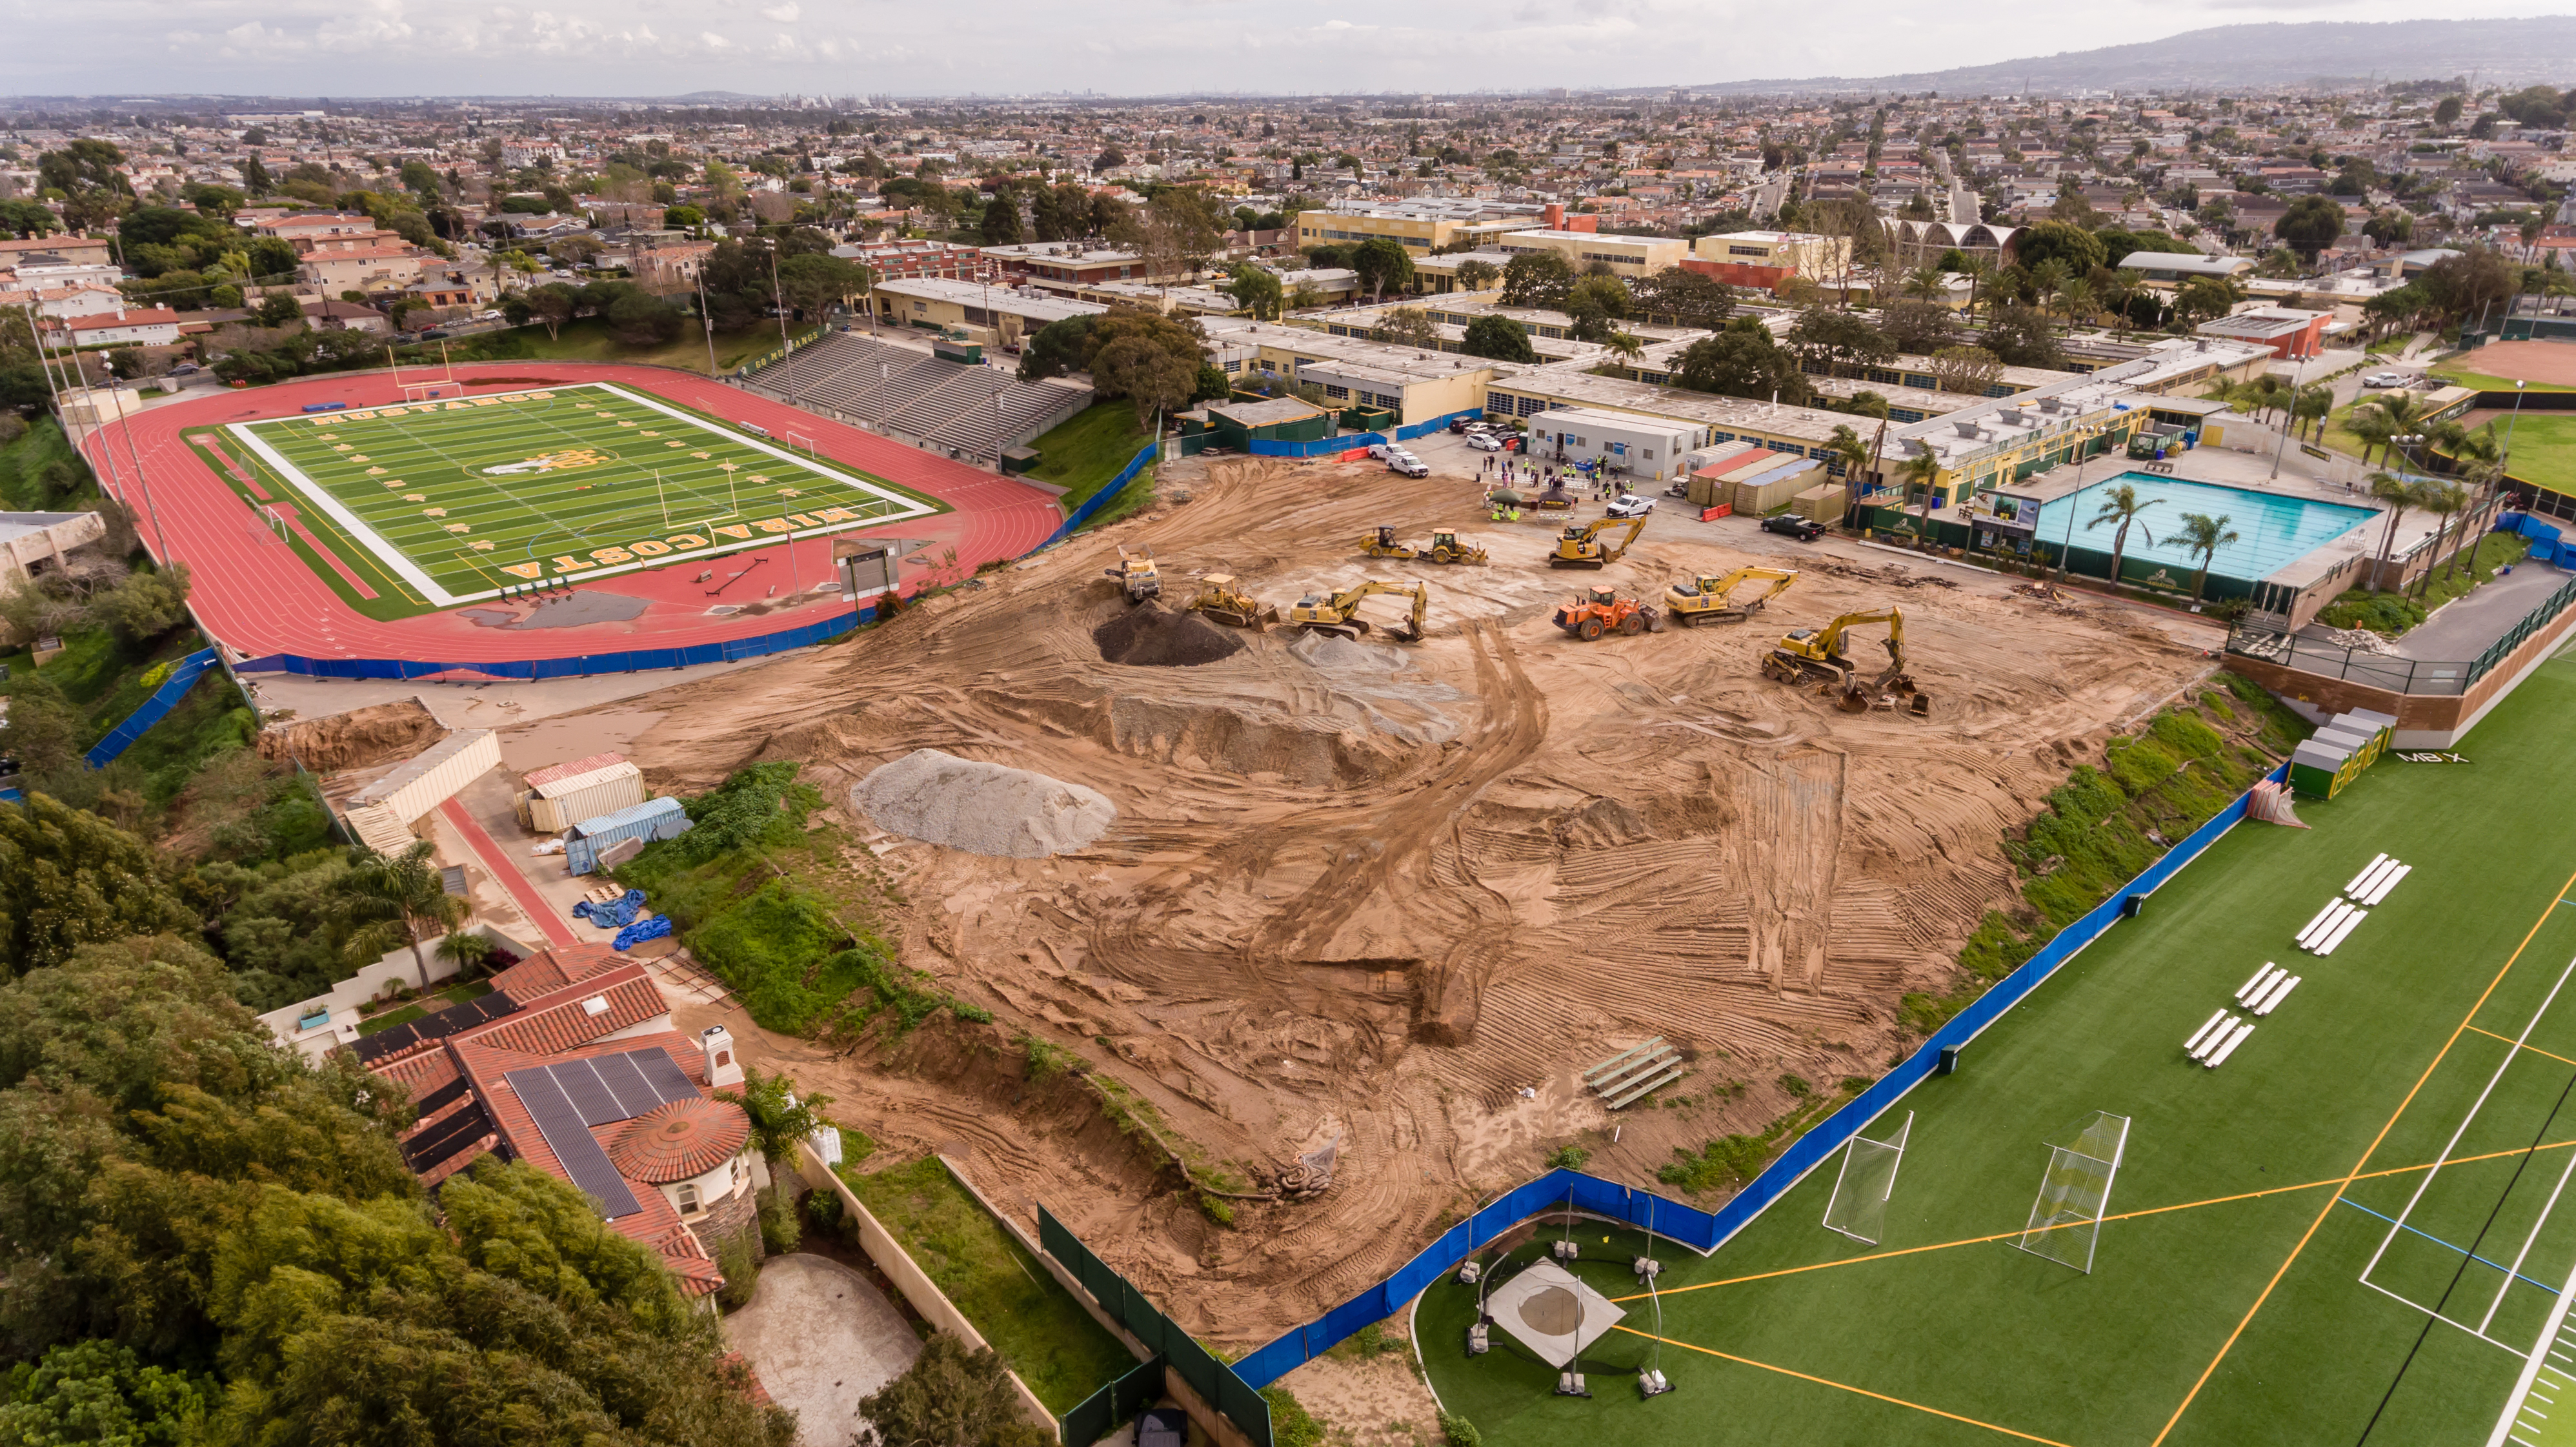 Mira Costa High School Breaks Ground On $38 Million Athletic Pertaining To Mira Costa High School Calendar 2020